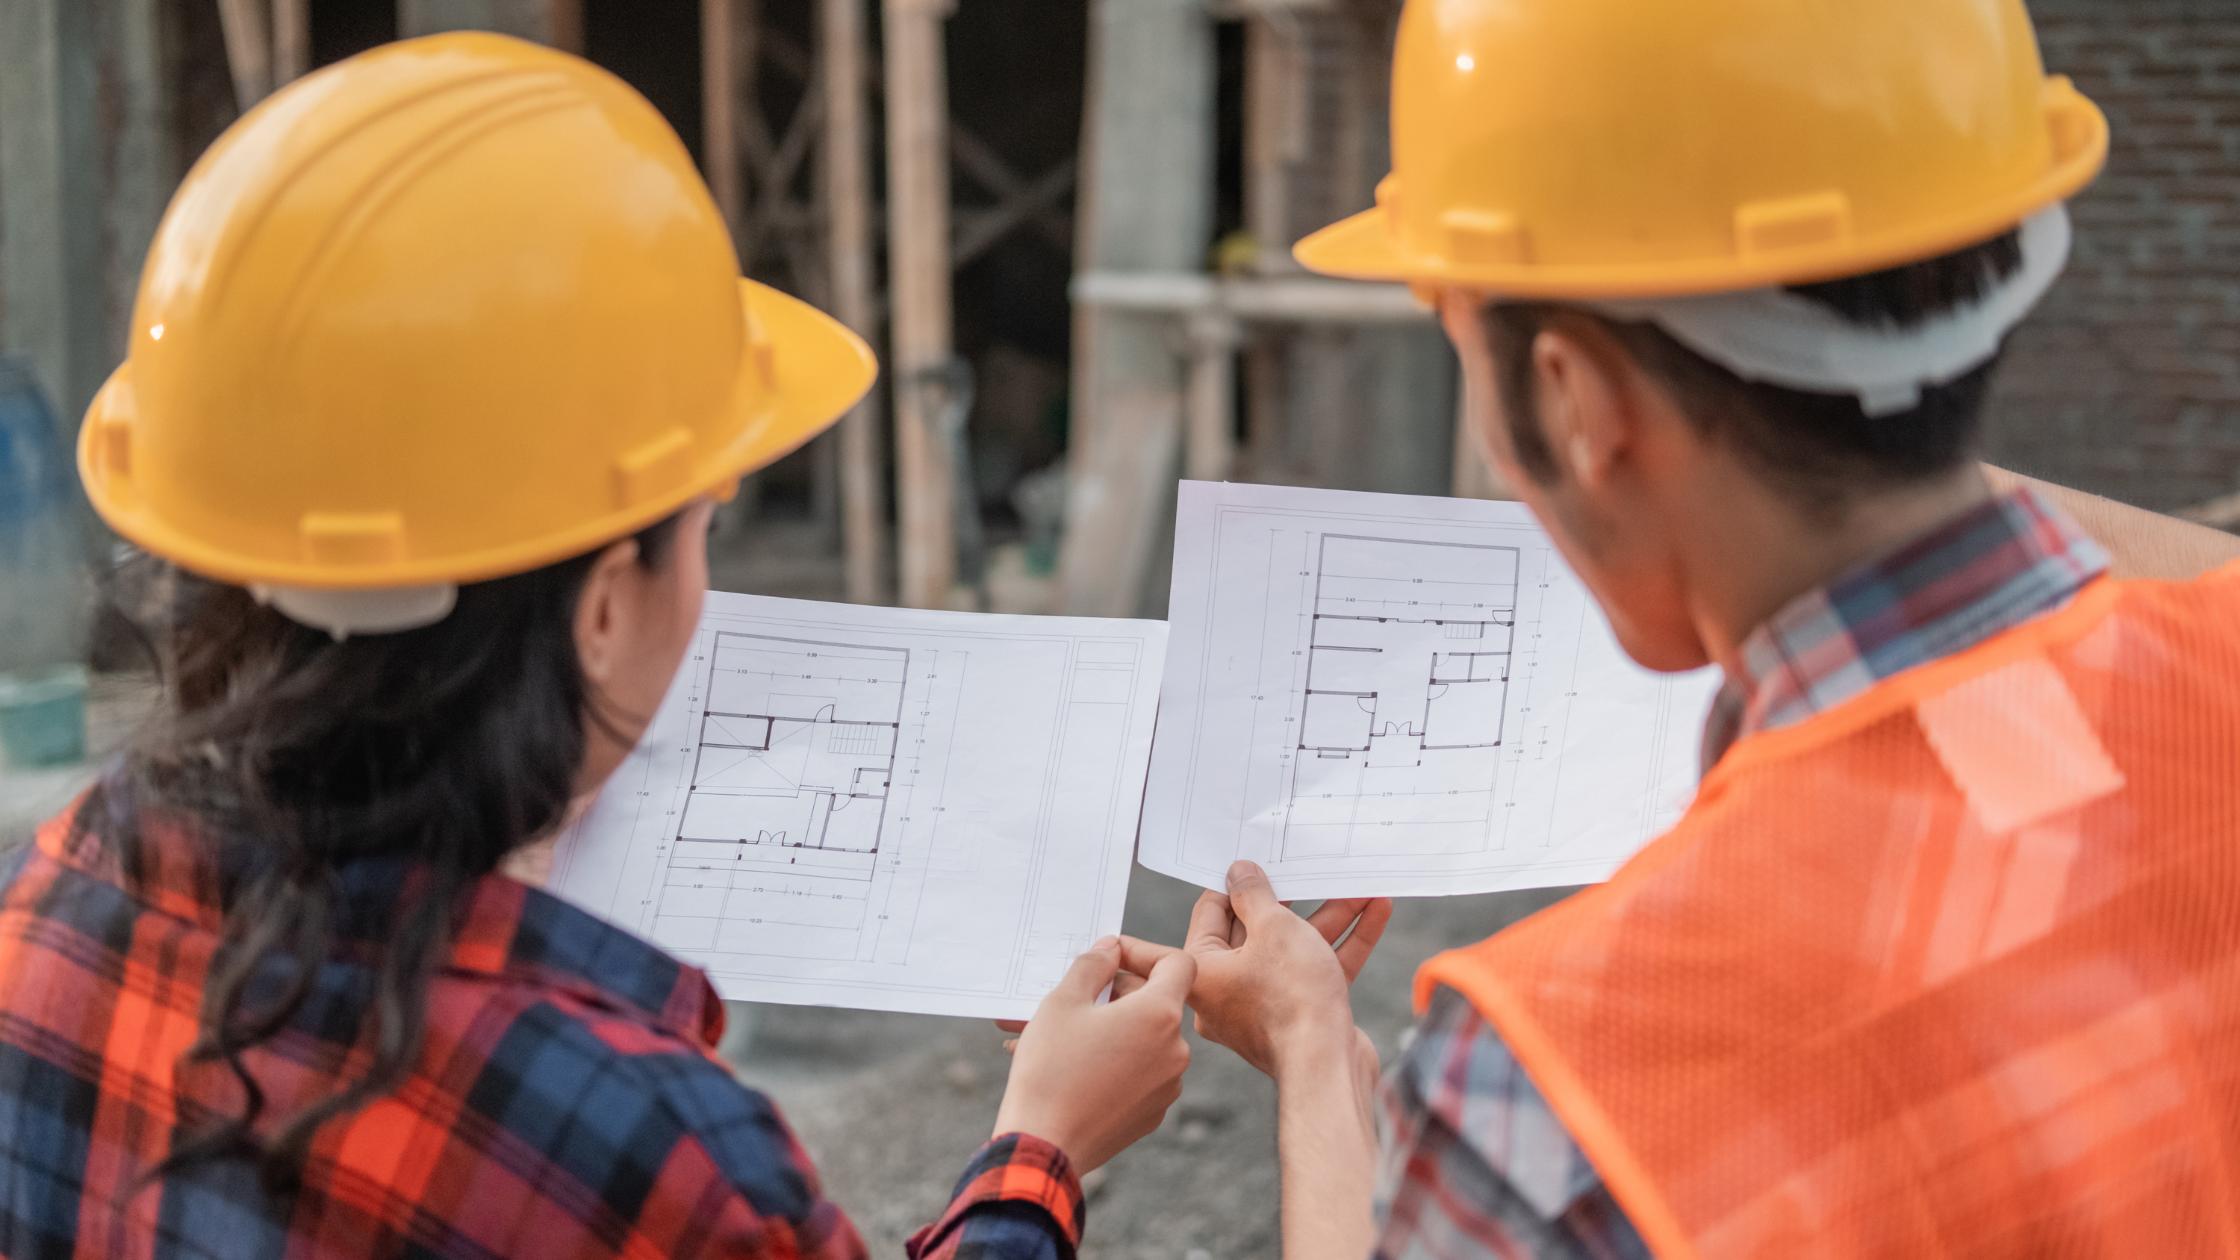 5 Reasons a Home Improvement Company Needs Digital Marketing